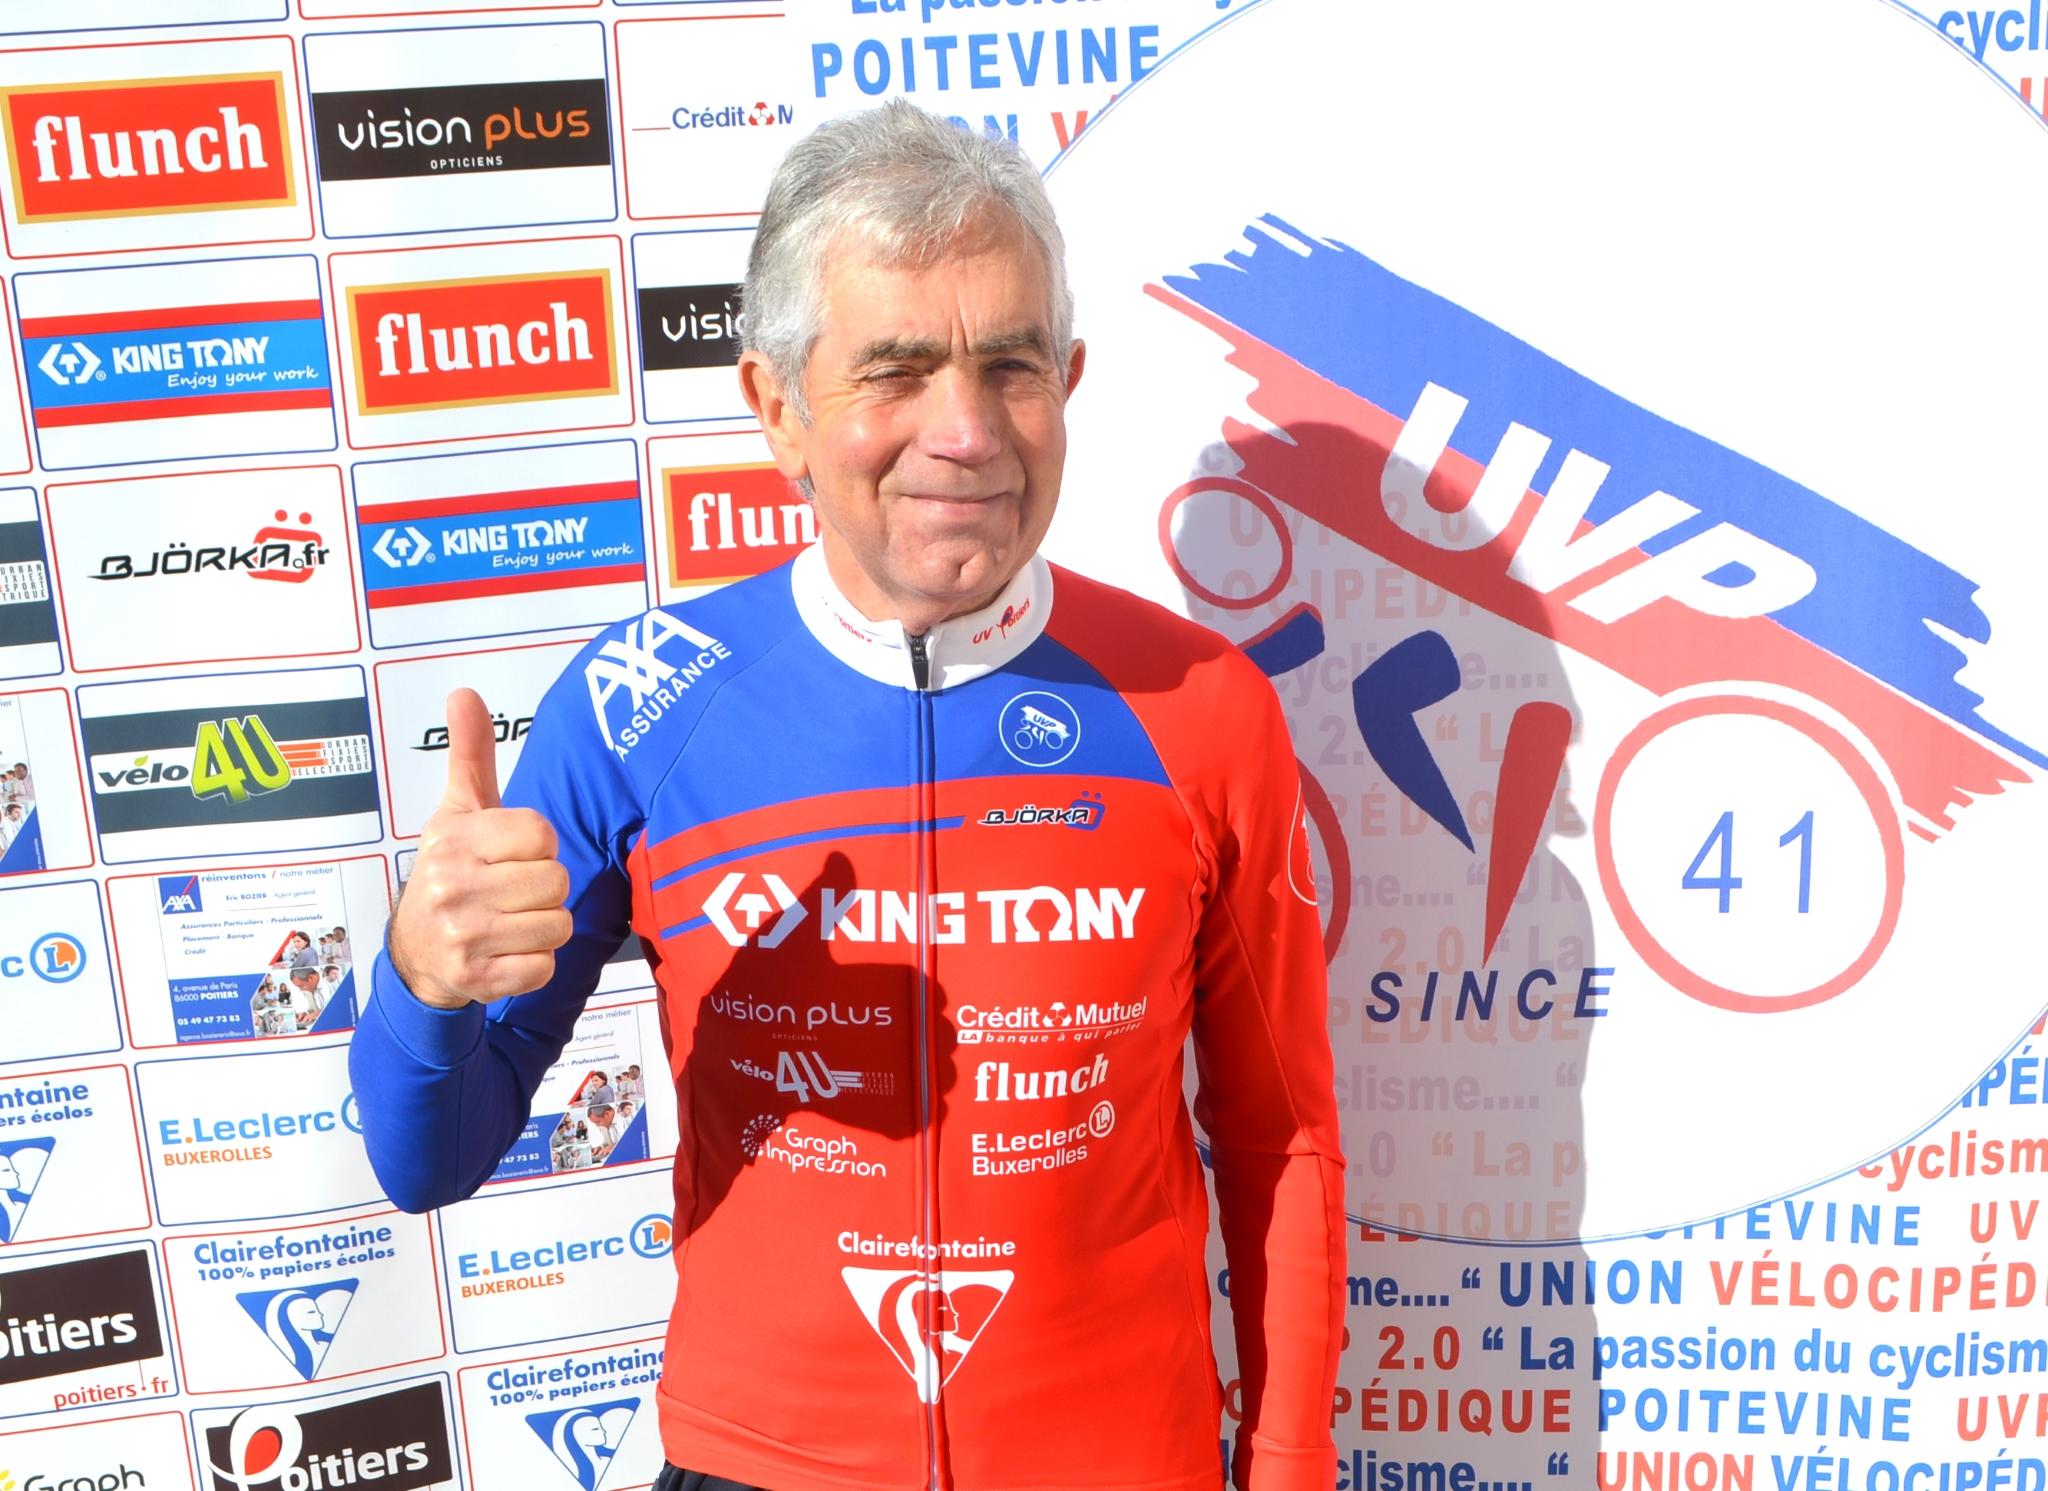 Jean-Claude GAGNOL